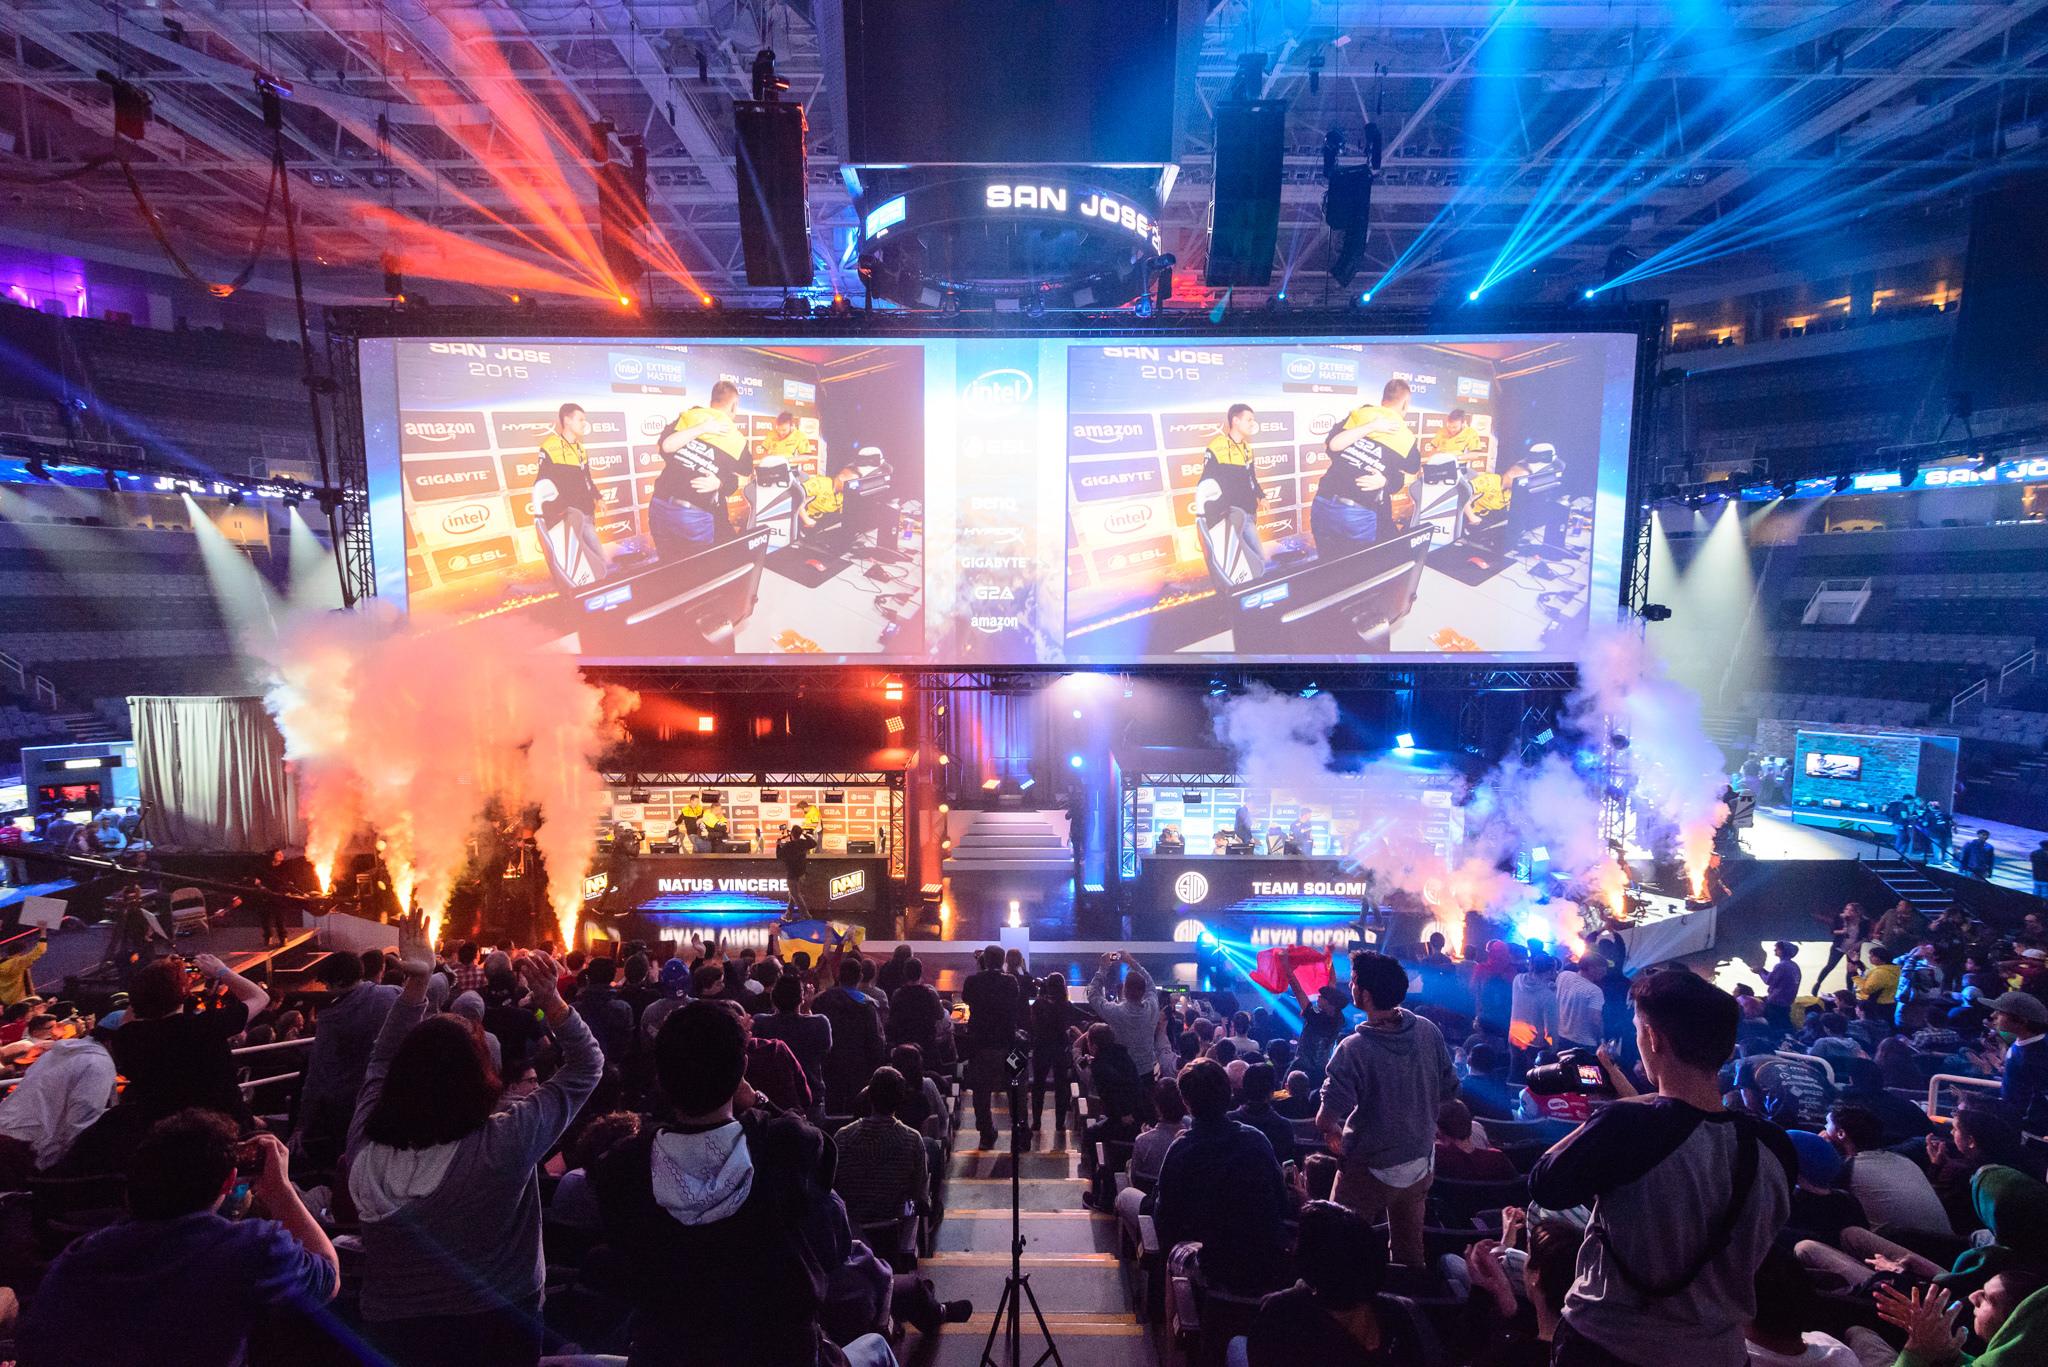 Intel Extreme Masters 2015 in San Jose, Calif., celebrated 10 years of bringing eSports to the globe through ESL.